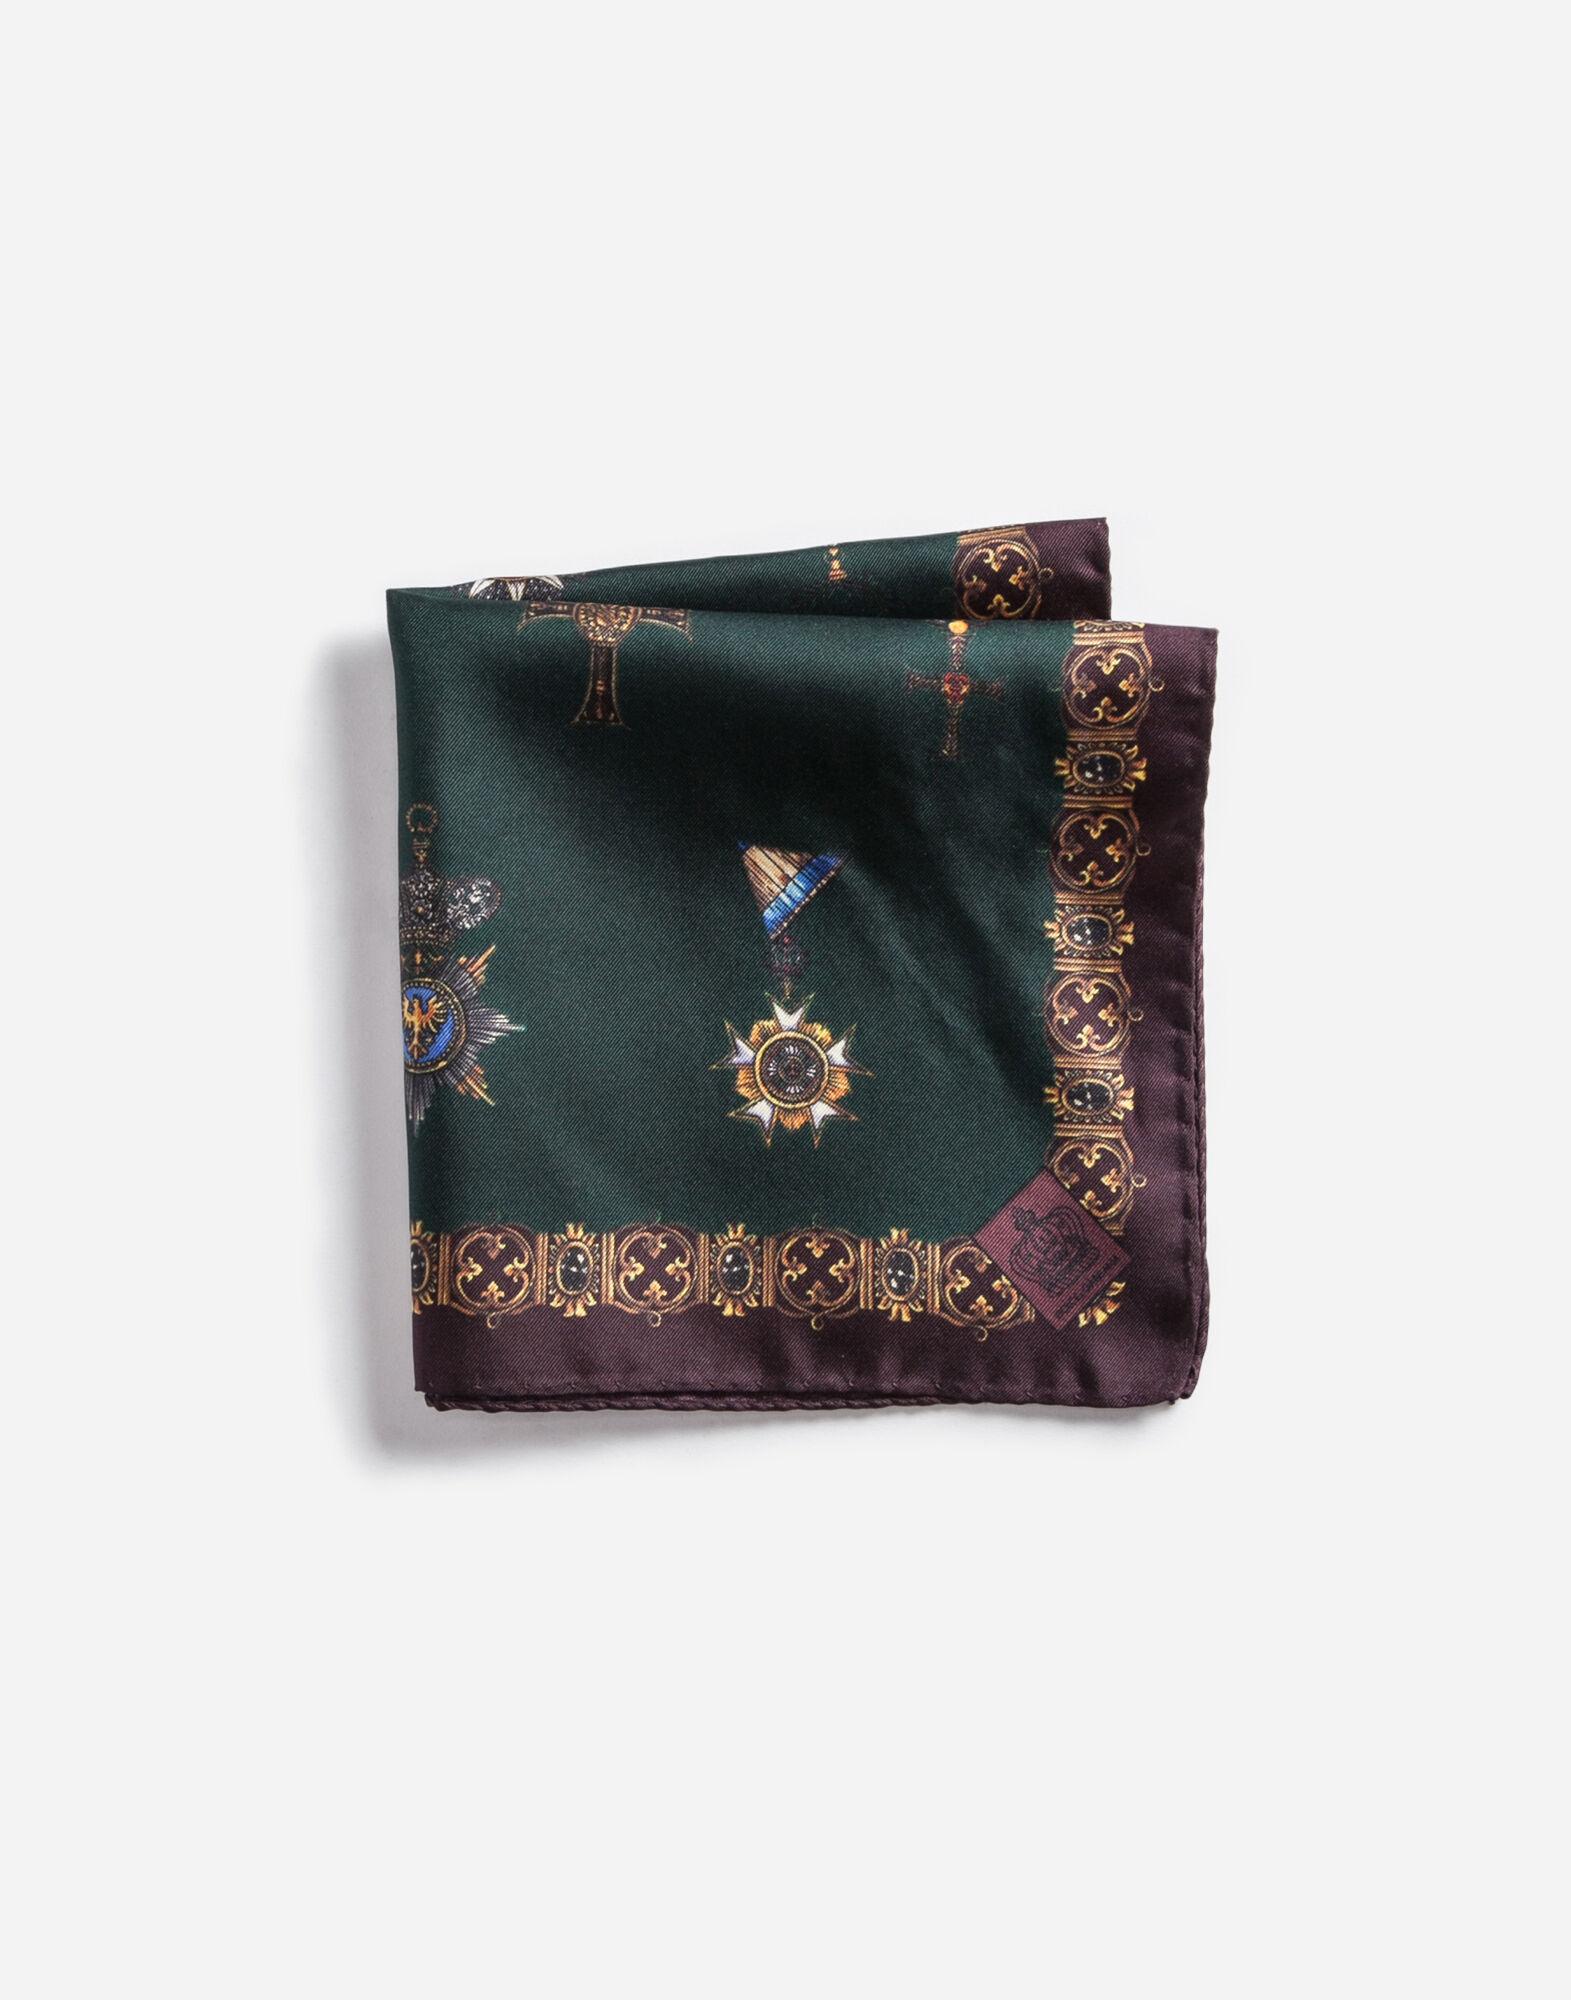 Dolce&Gabbana PRINTED SILK POCKET SQUARE